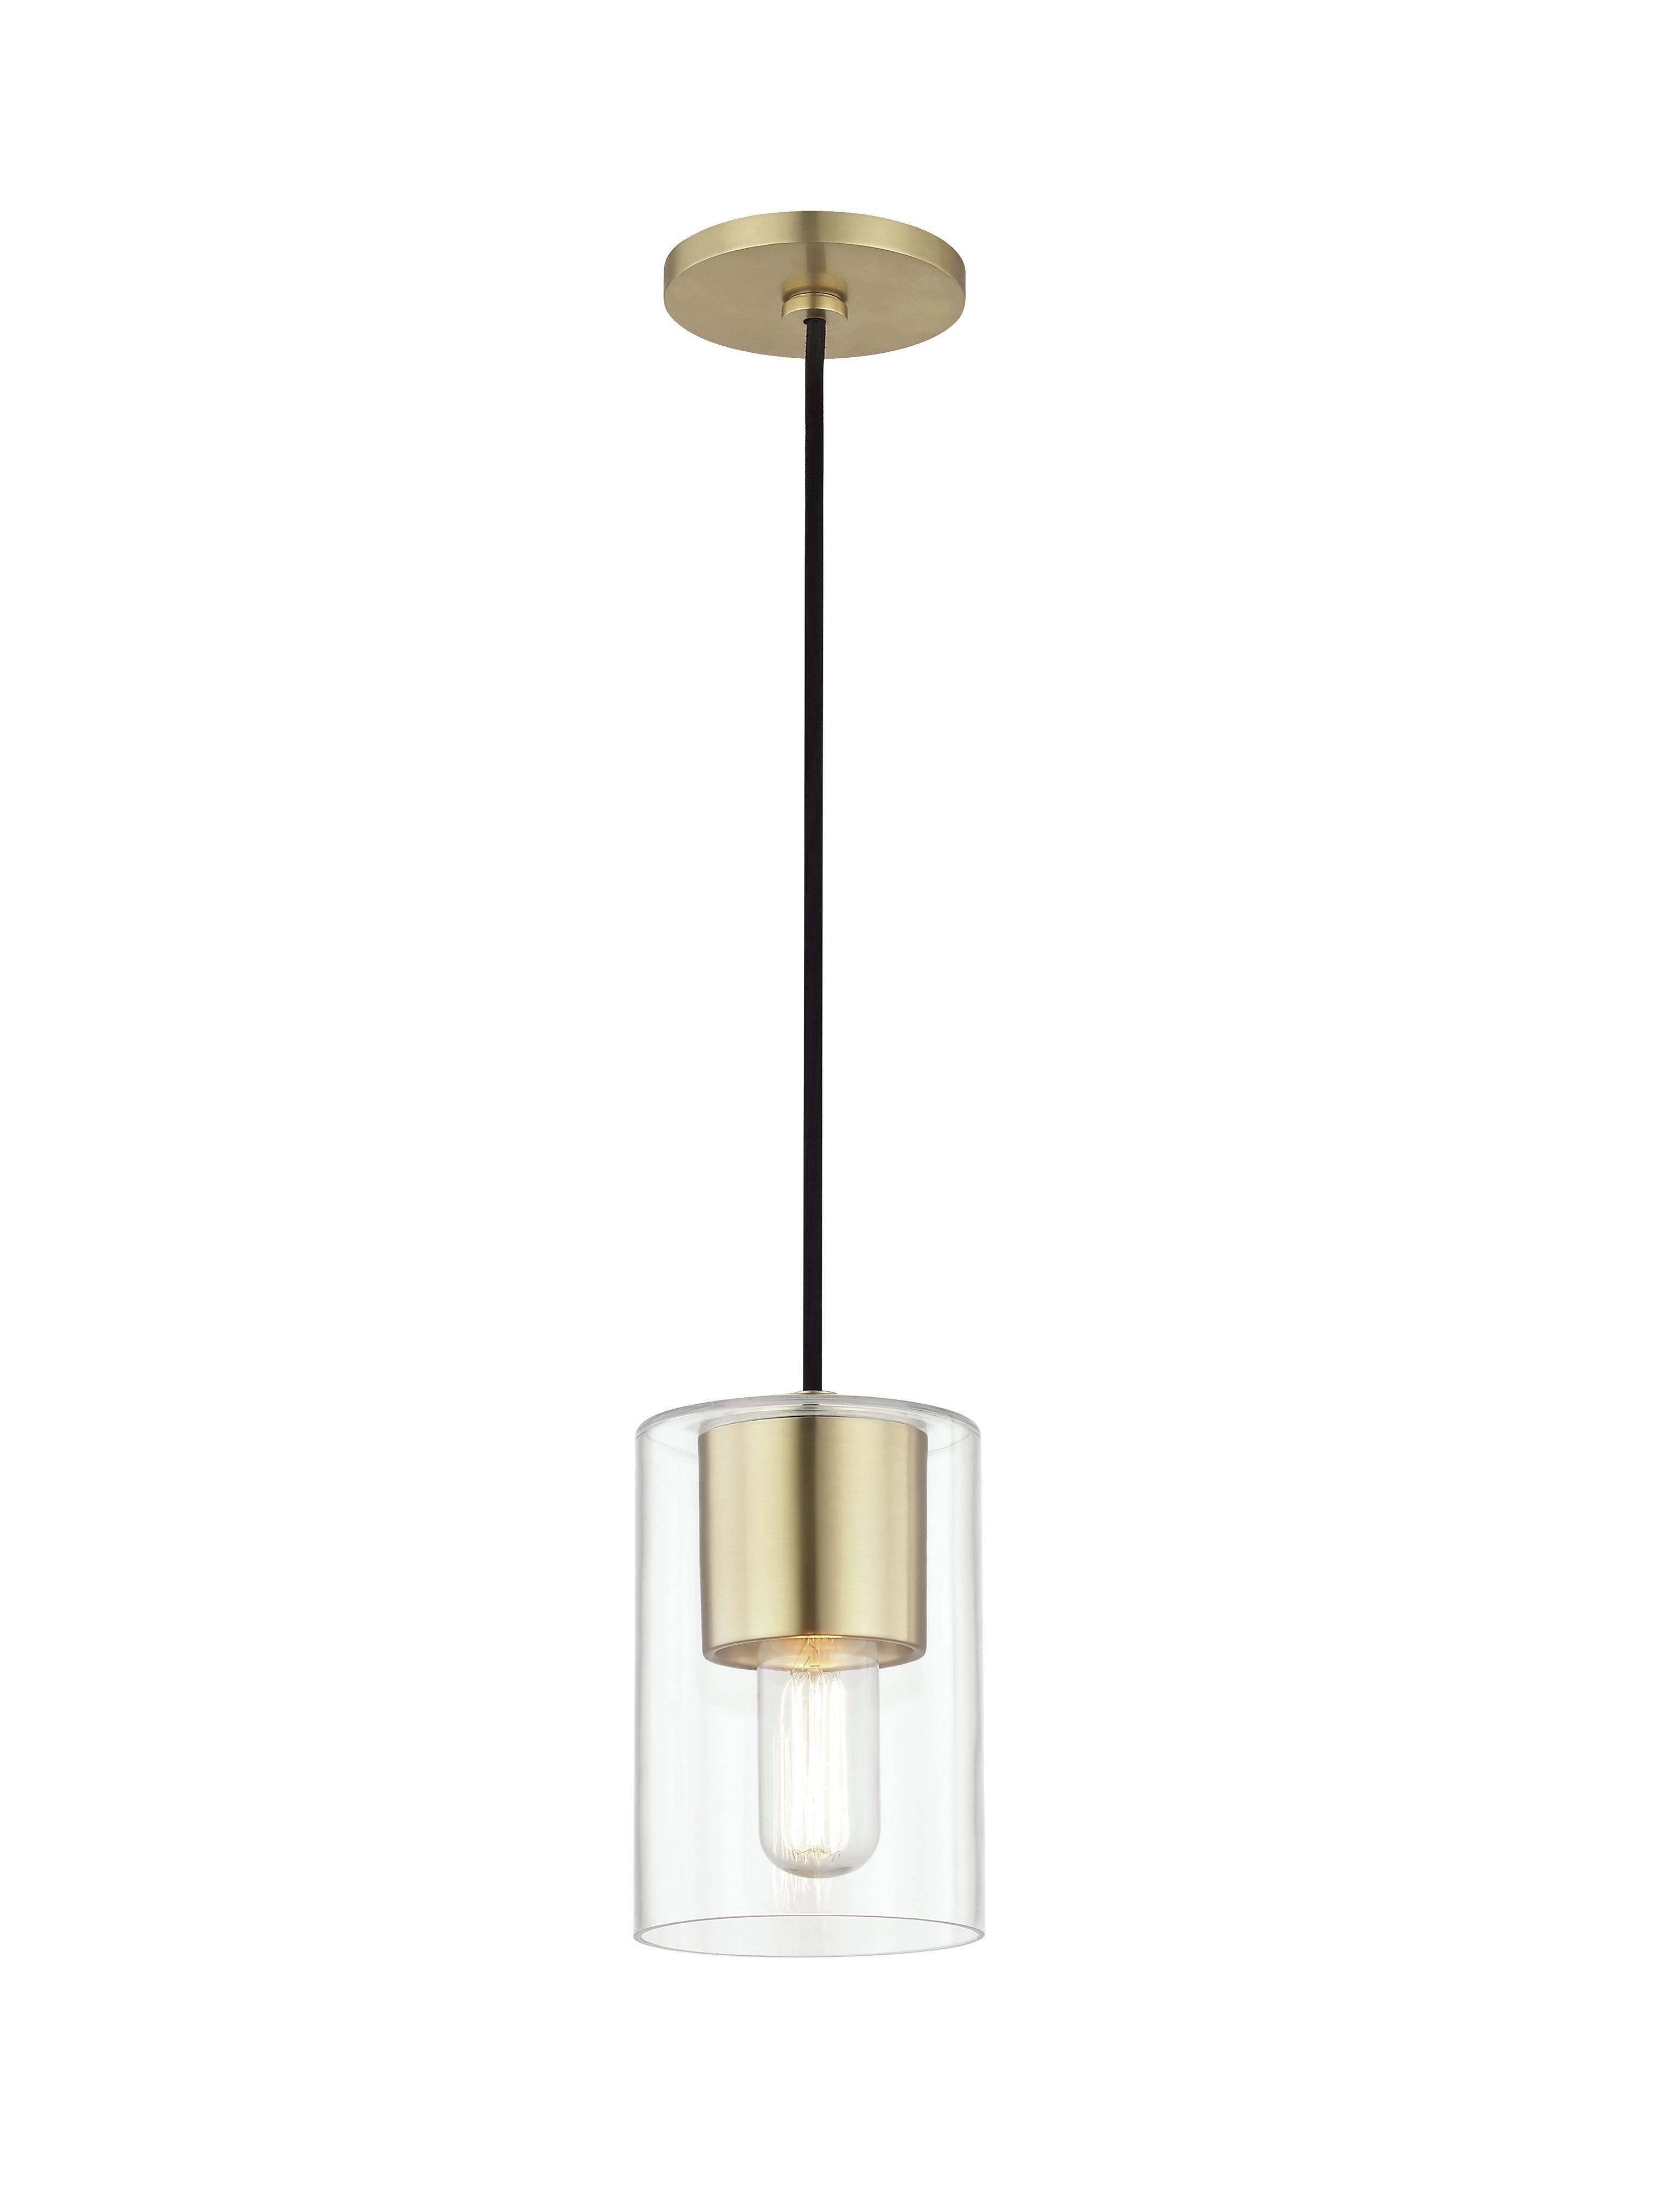 Damp Location Pendant Lighting | Joss & Main With Bainbridge 1 Light Single Cylinder Pendants (View 9 of 30)